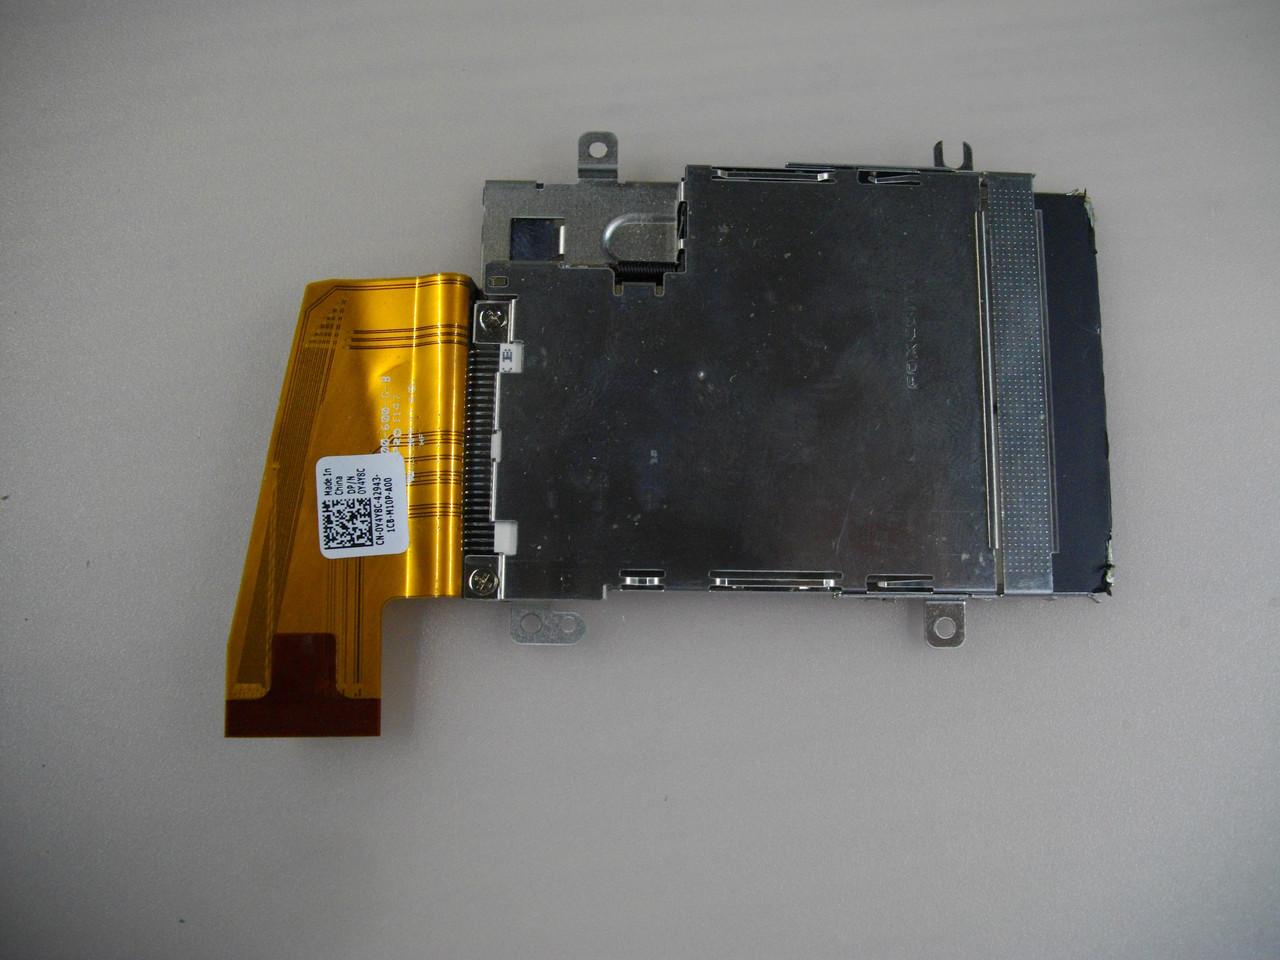 Expresscard HP EliteBook 8460p